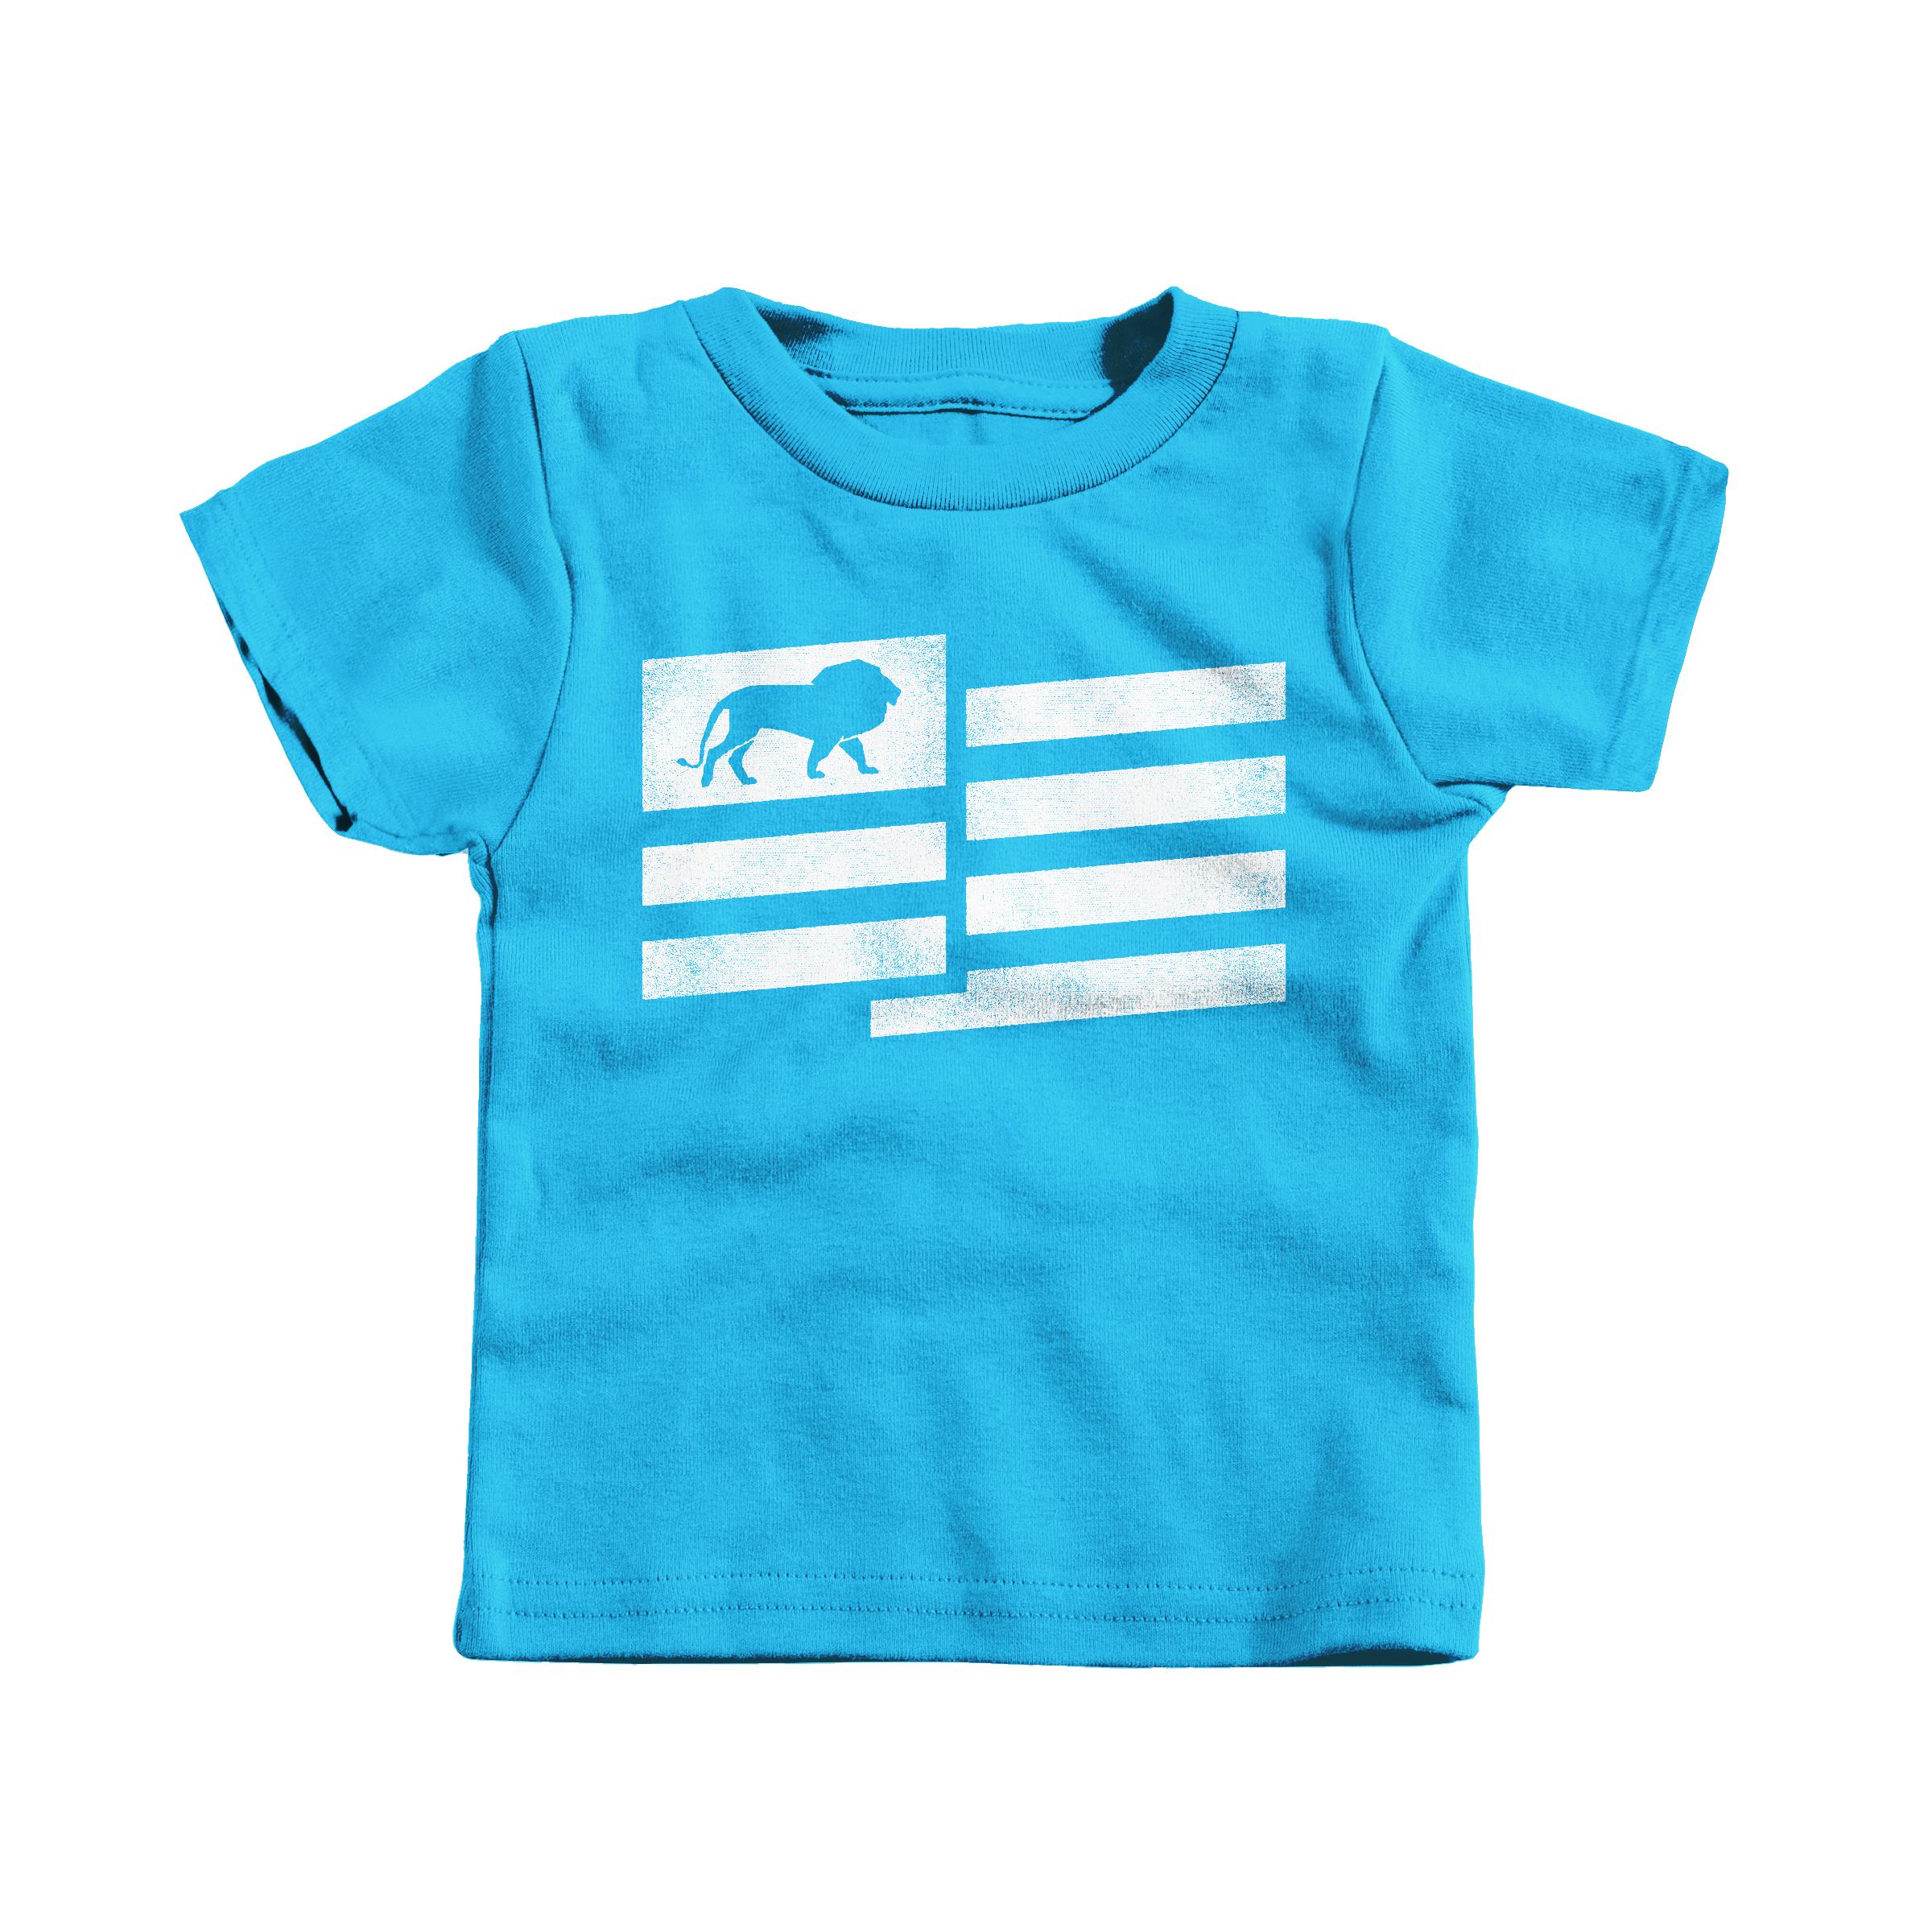 Lion Nation Turquoise (T-Shirt)